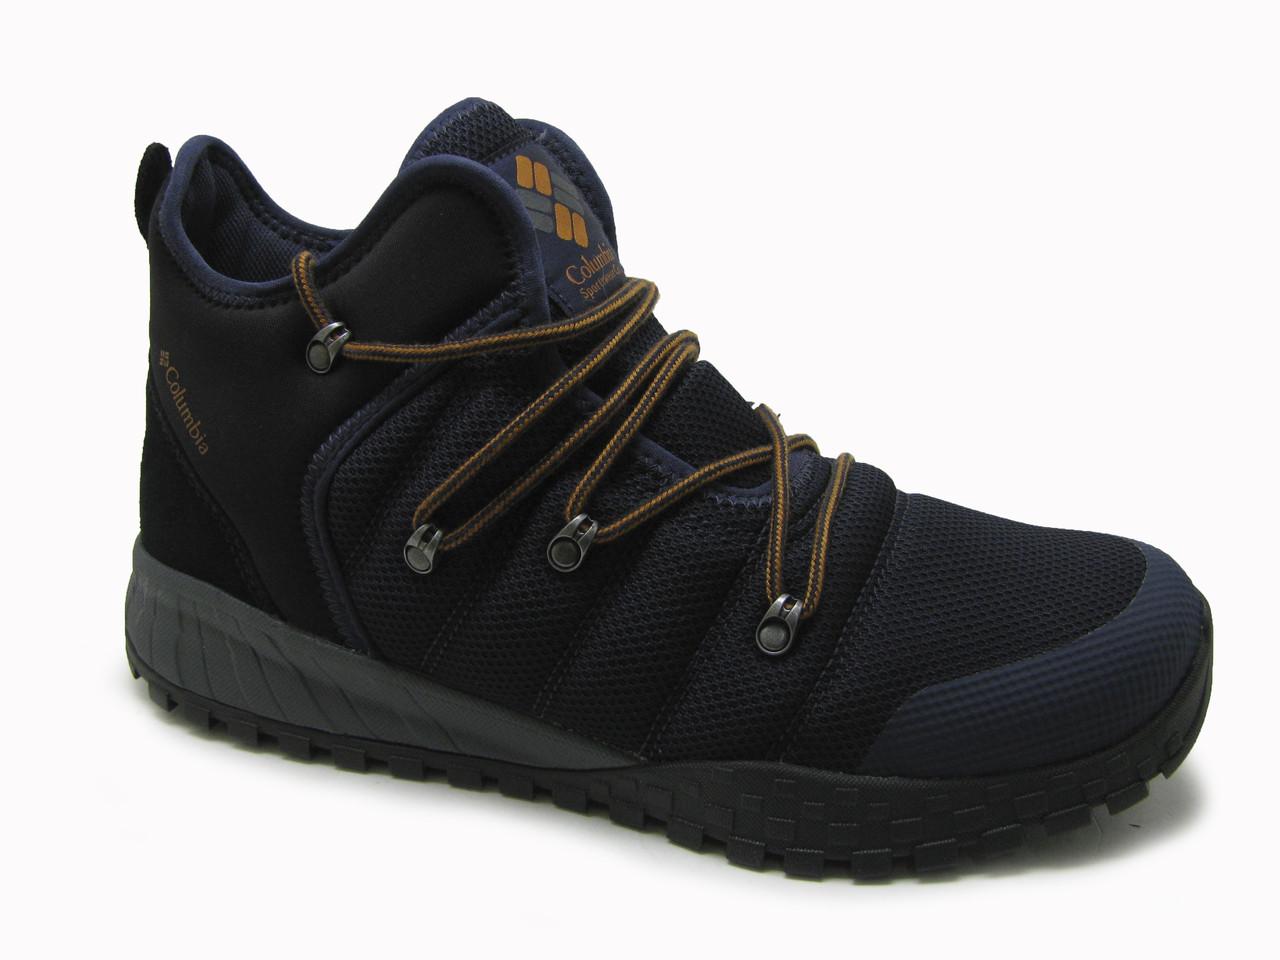 Ботинки мужские зимние Columbia Firebanks 503